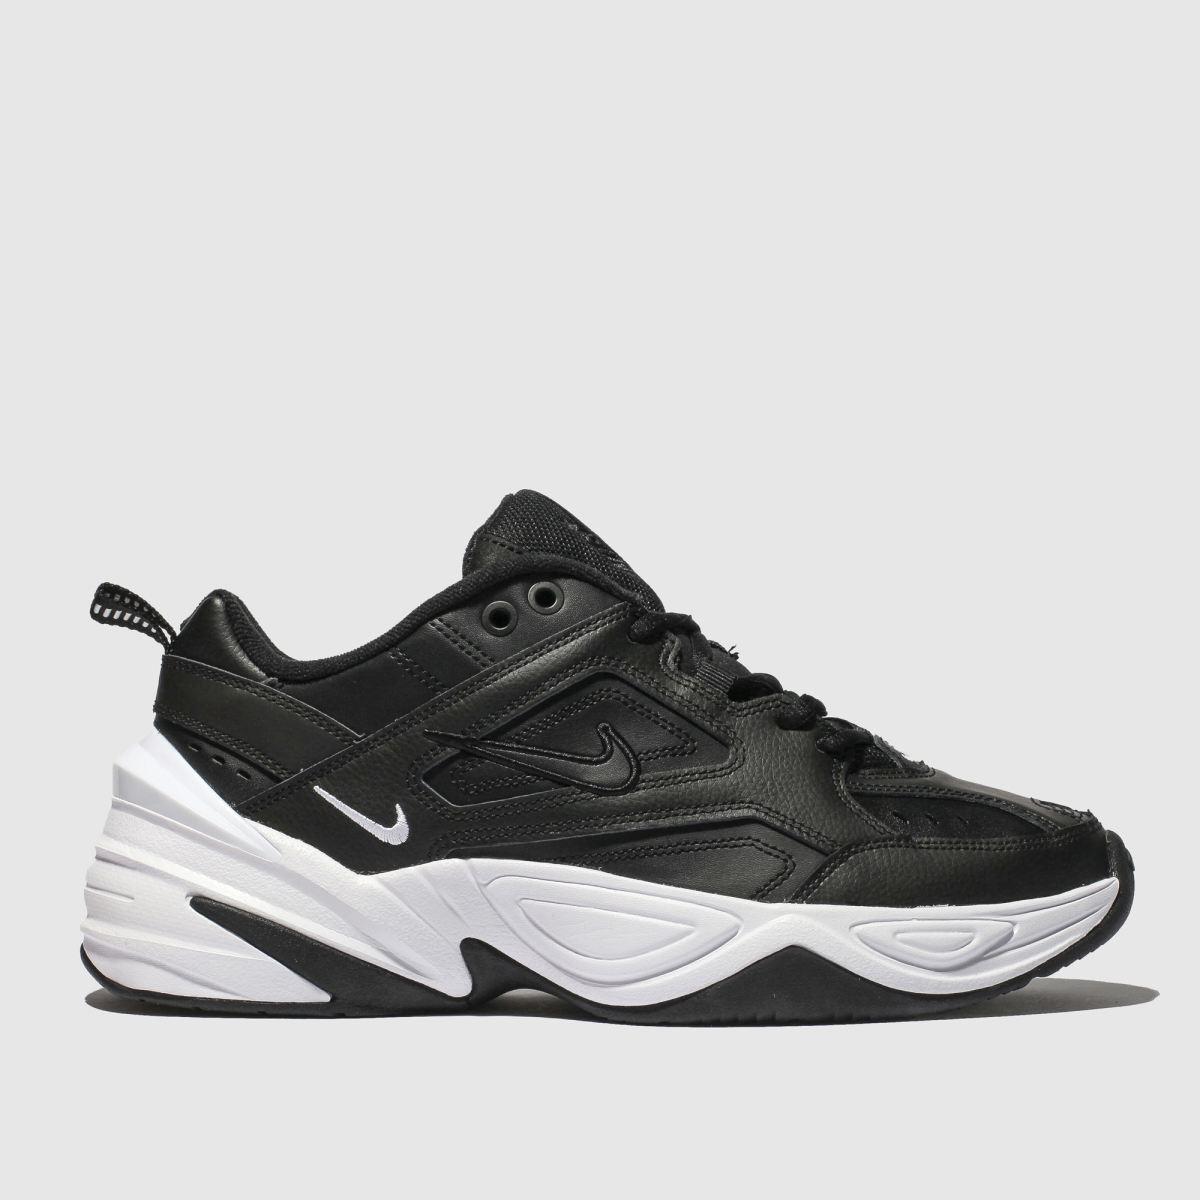 Nike Black & White M2k Tekno Trainers